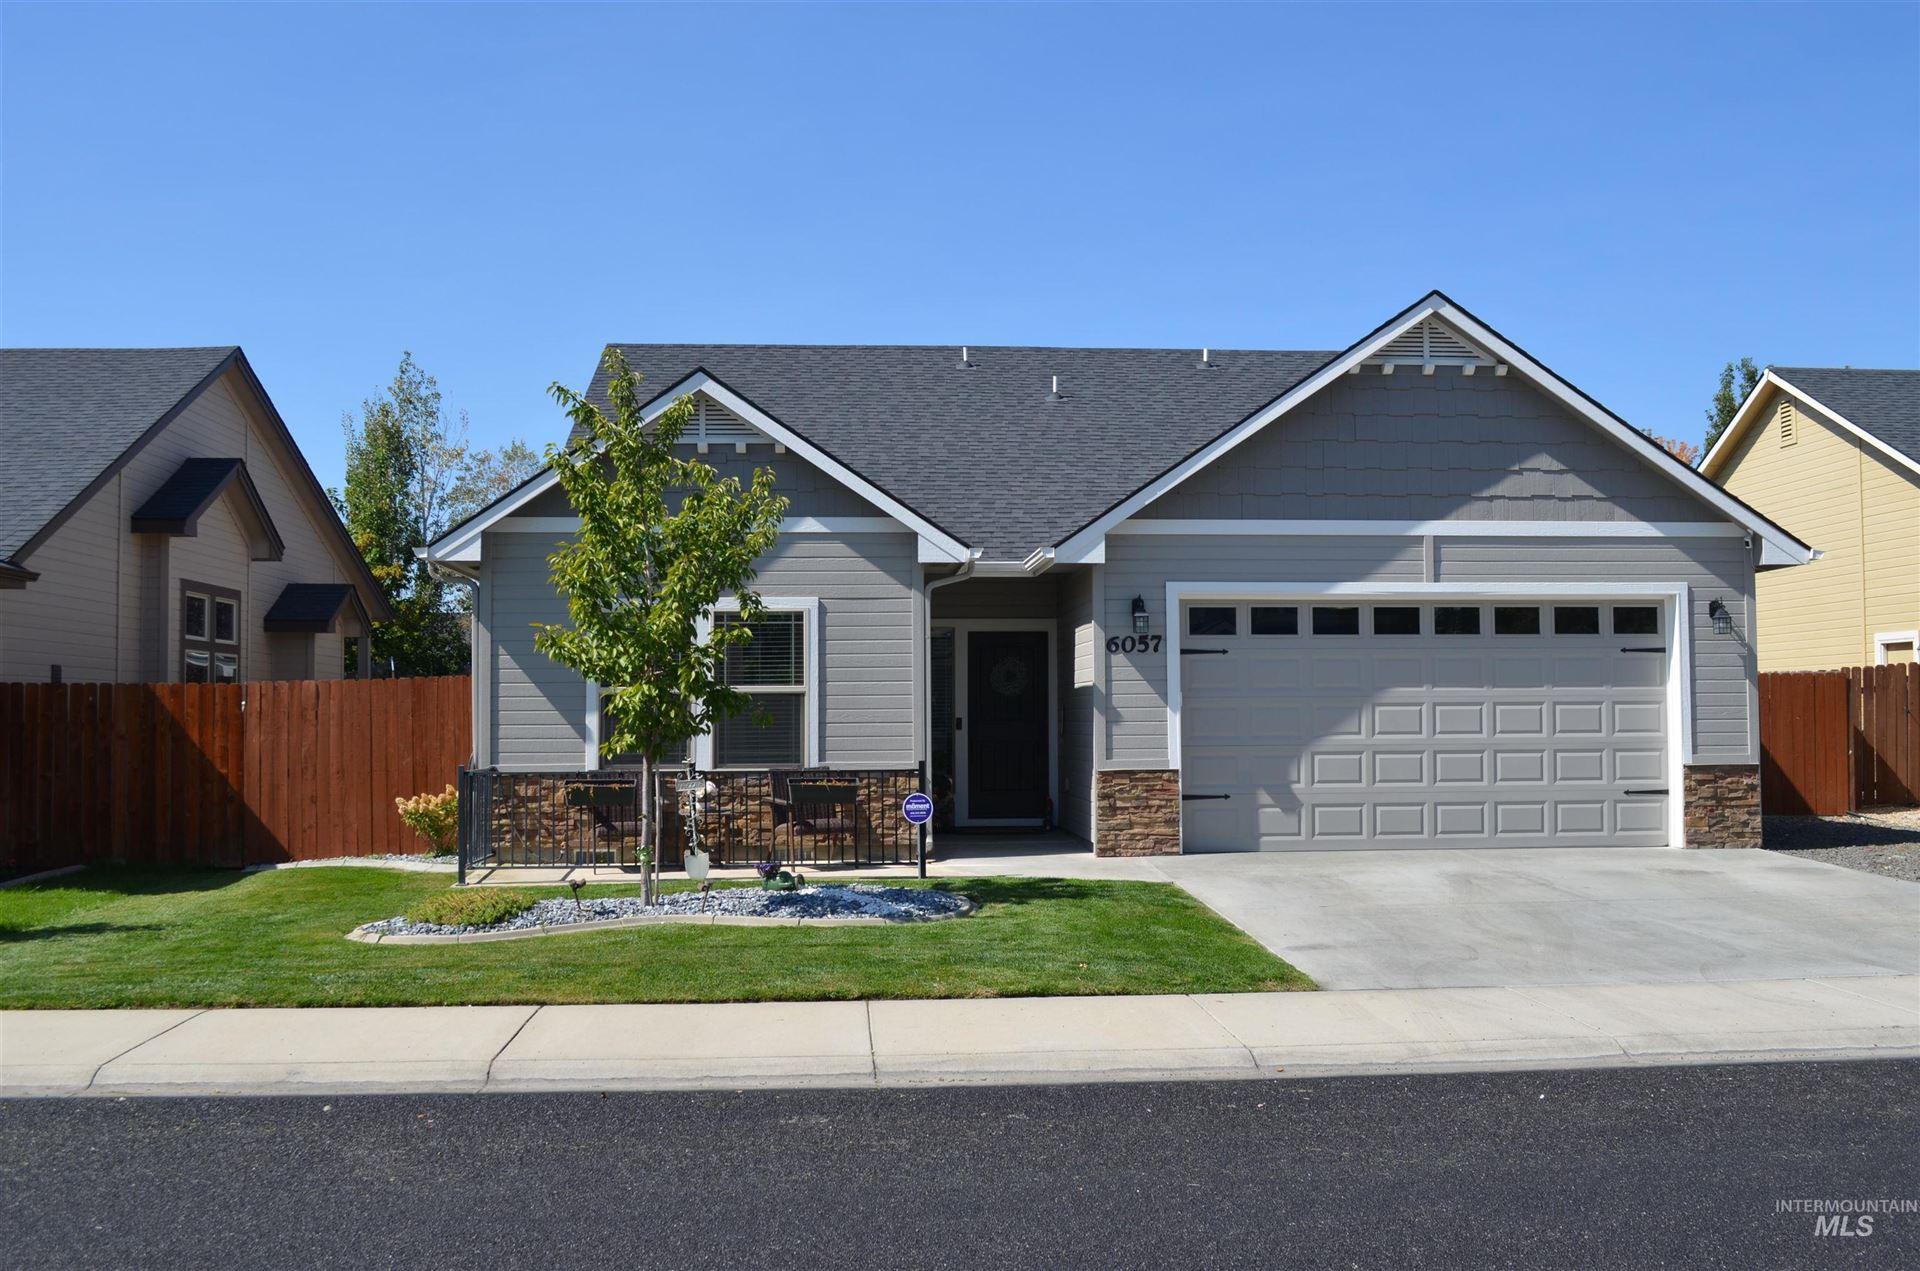 6057 S Egmont Ave, Boise, ID 83709 - MLS#: 98819314